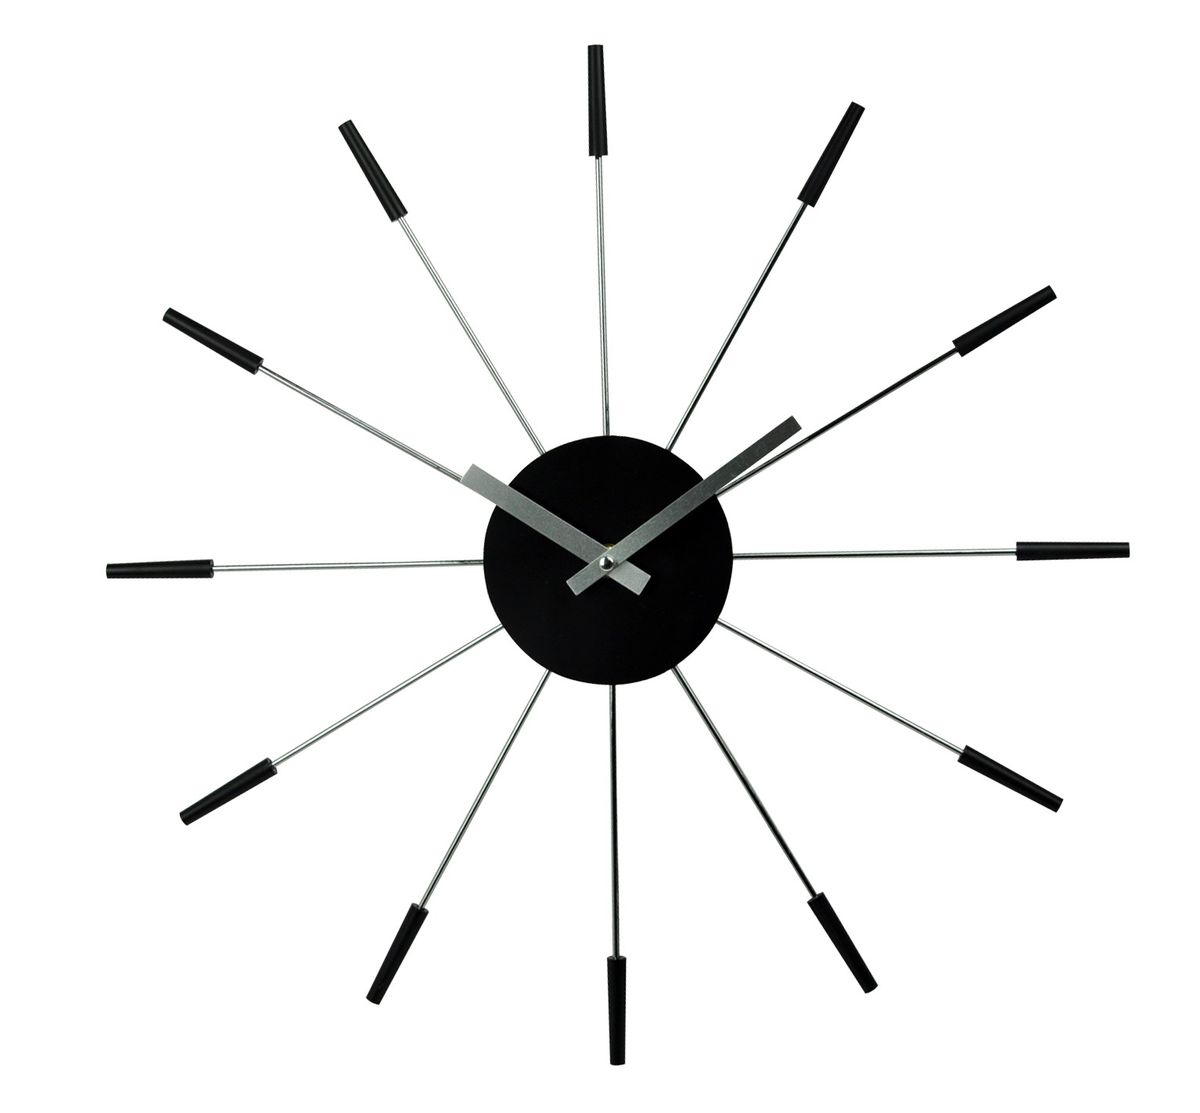 Часы настенные Arte Nuevo, диаметр 40 см. EG7021 часы настенные arte nuevo sweet home 21 5 см